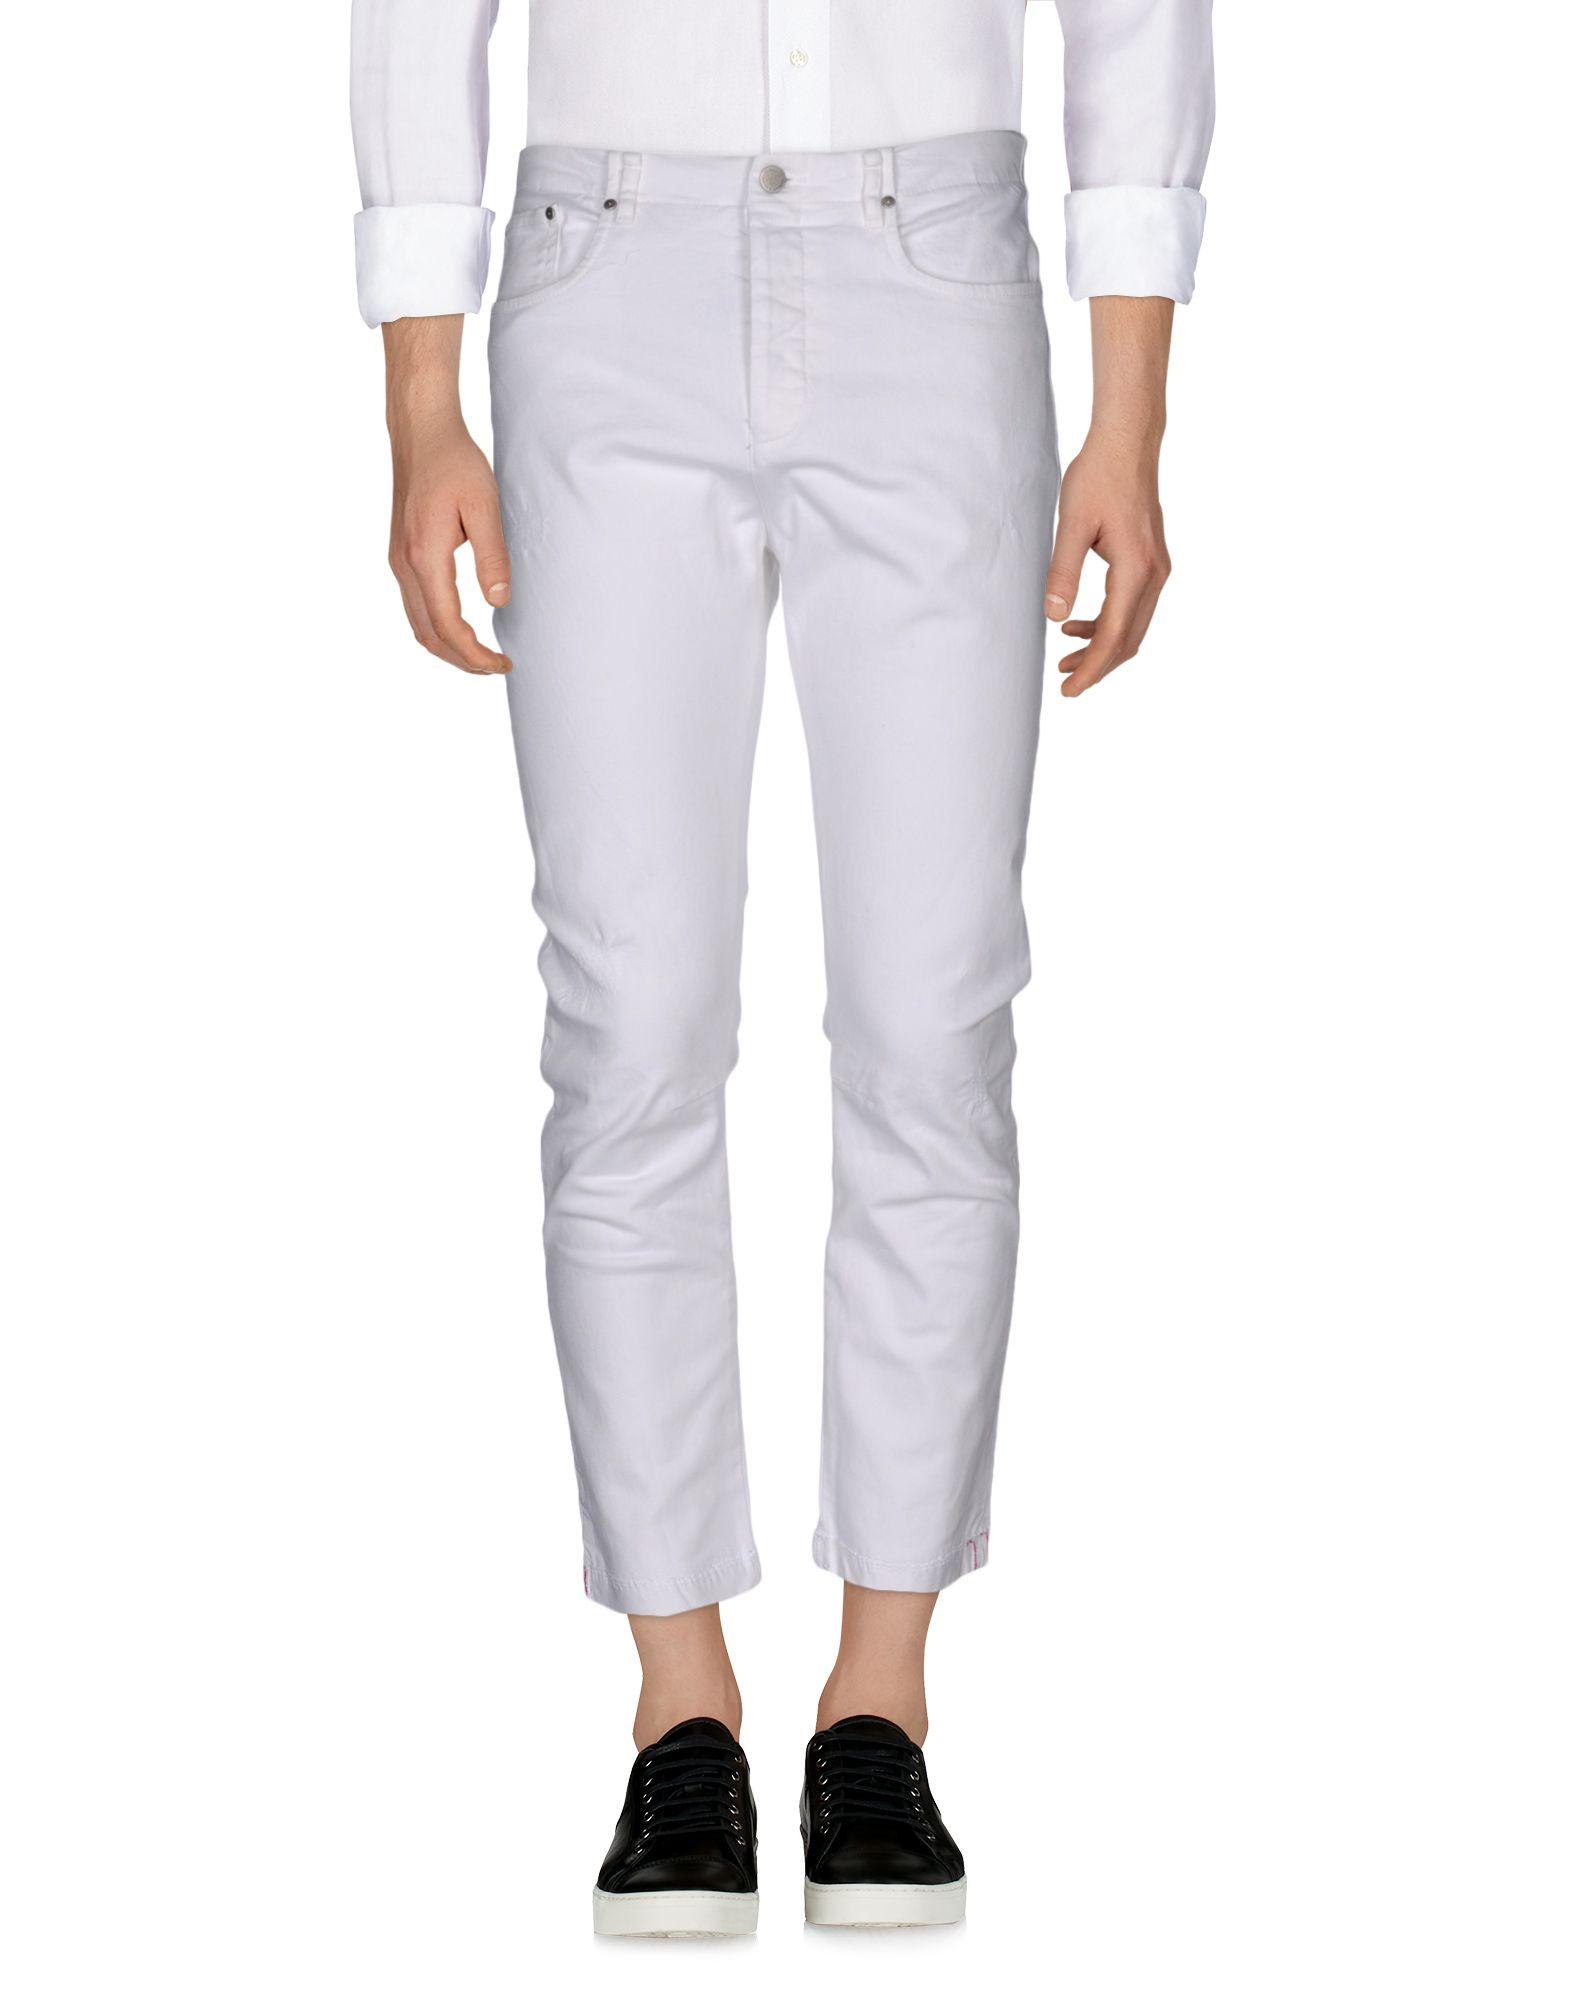 Pantaloni Jeans Daniele Alessandrini Homme Uomo - Acquista online su